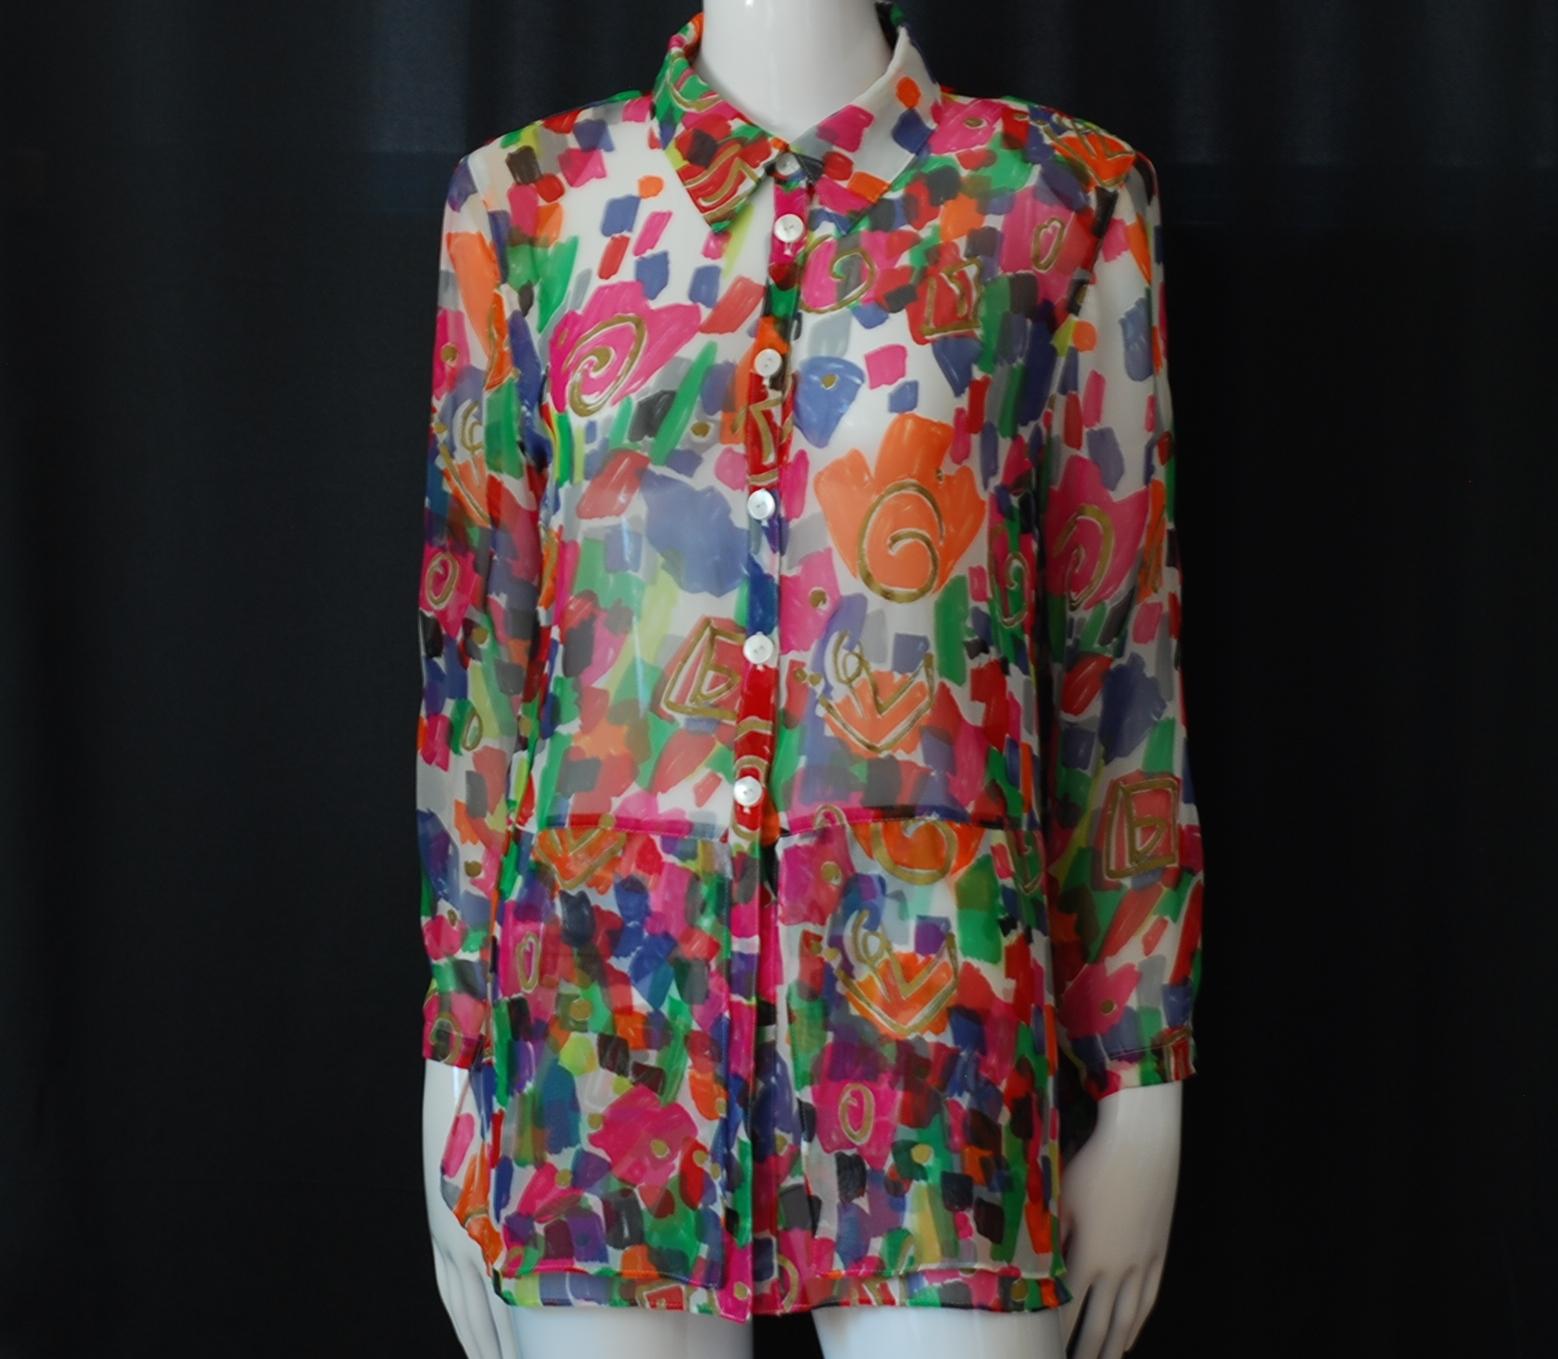 ea66ab237 Louis Feraud Licensed Summer Silk Over Blouse | QUIET WEST VINTAGE